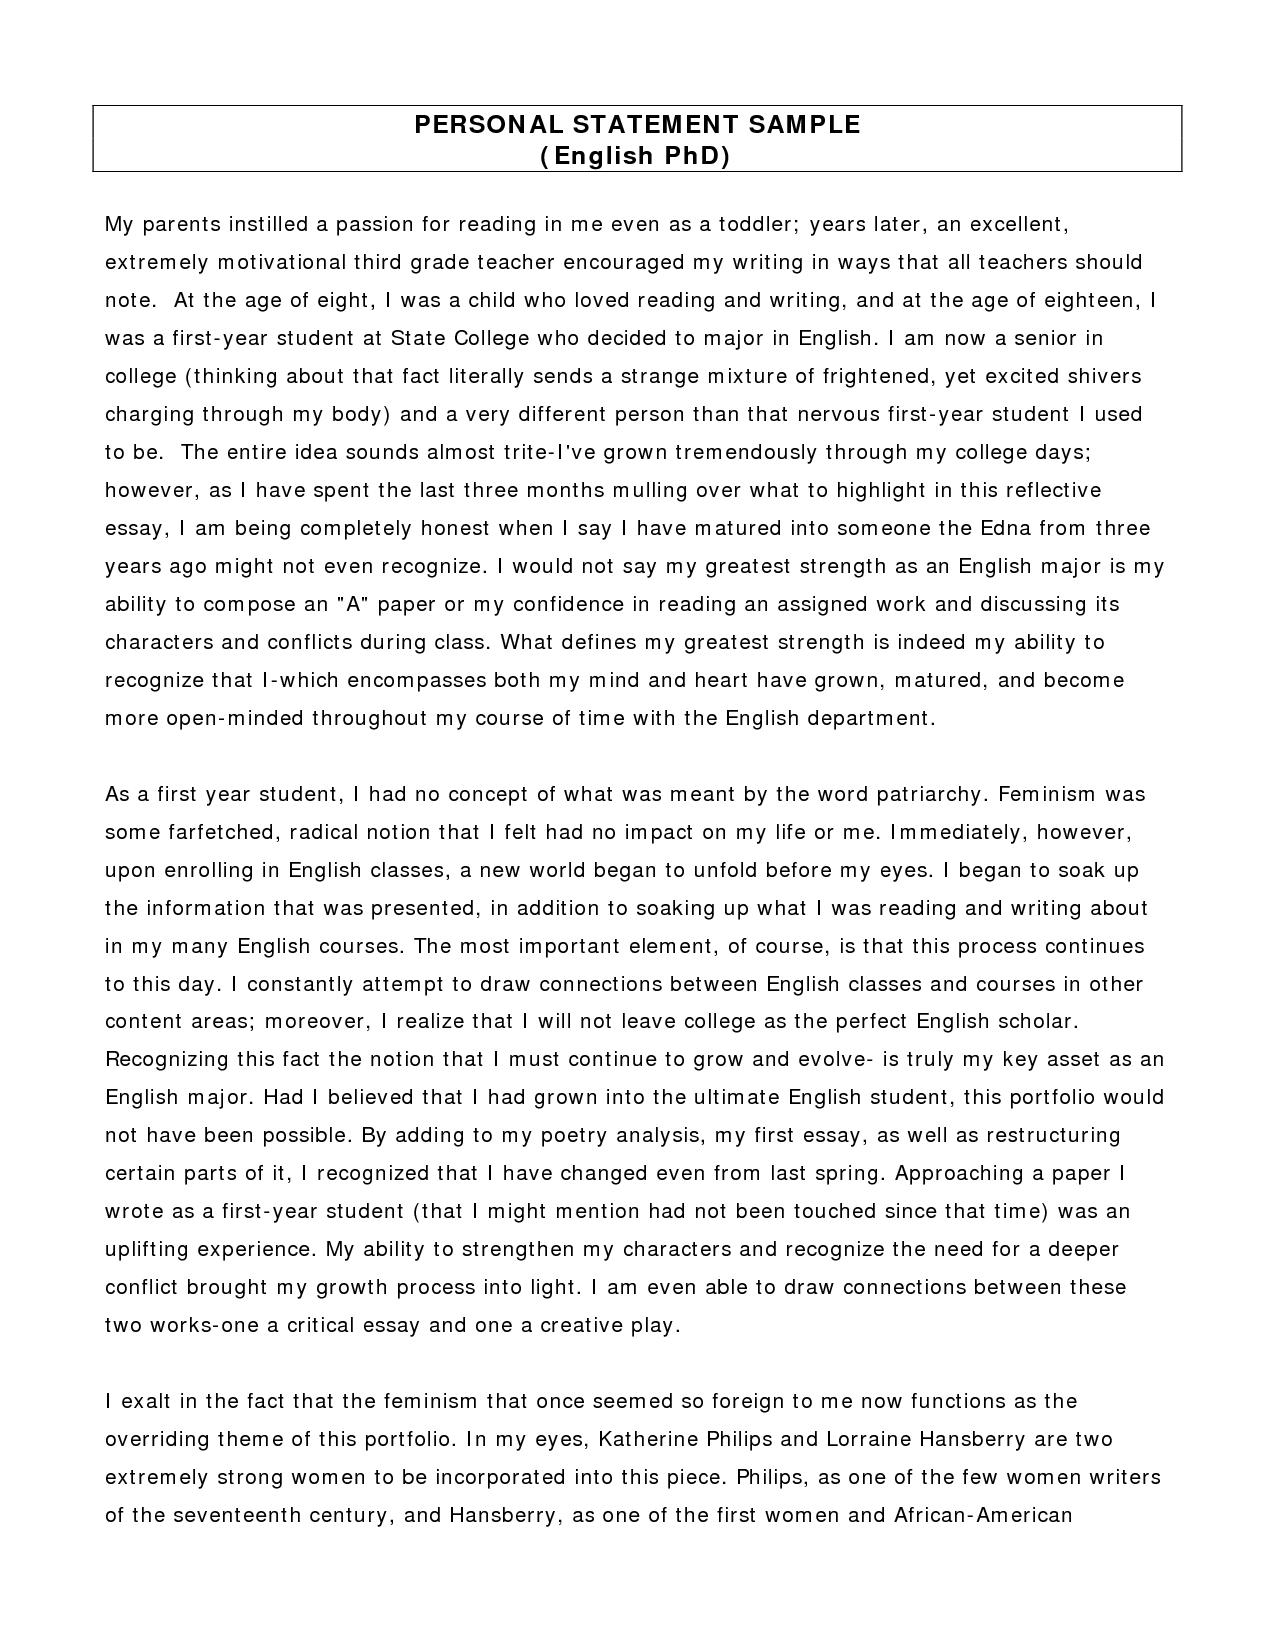 022 Essay Example Reflective Postgraduate Personal Statement